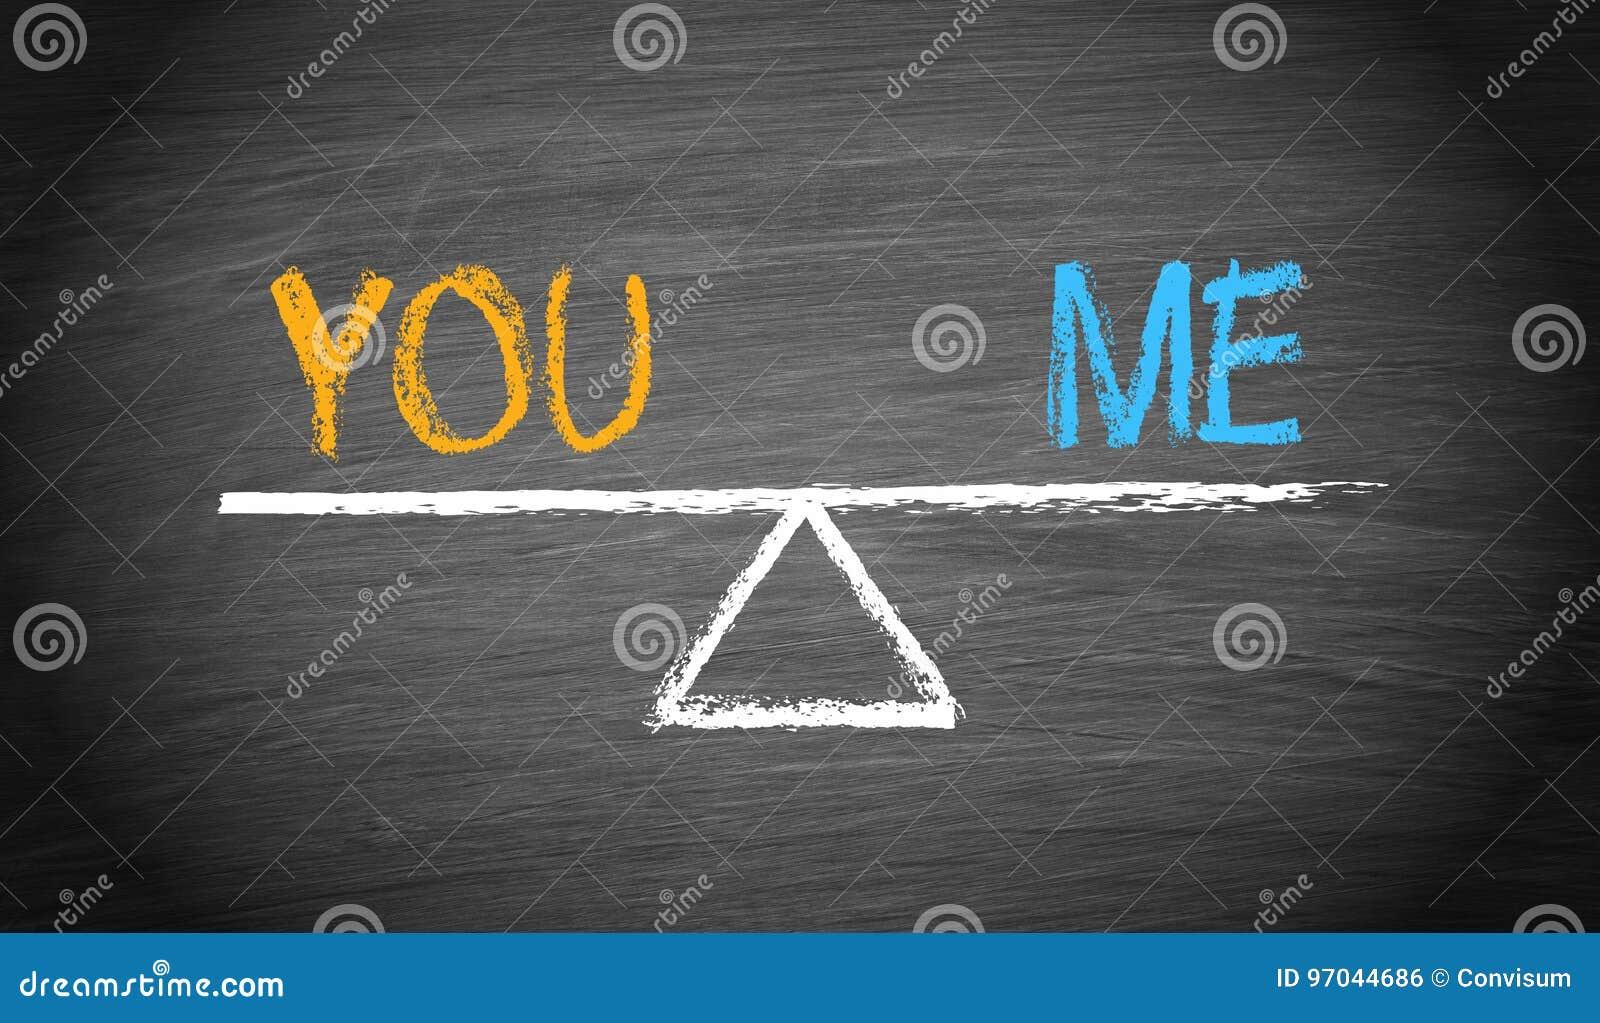 Voi e me - equilibrio di associazione